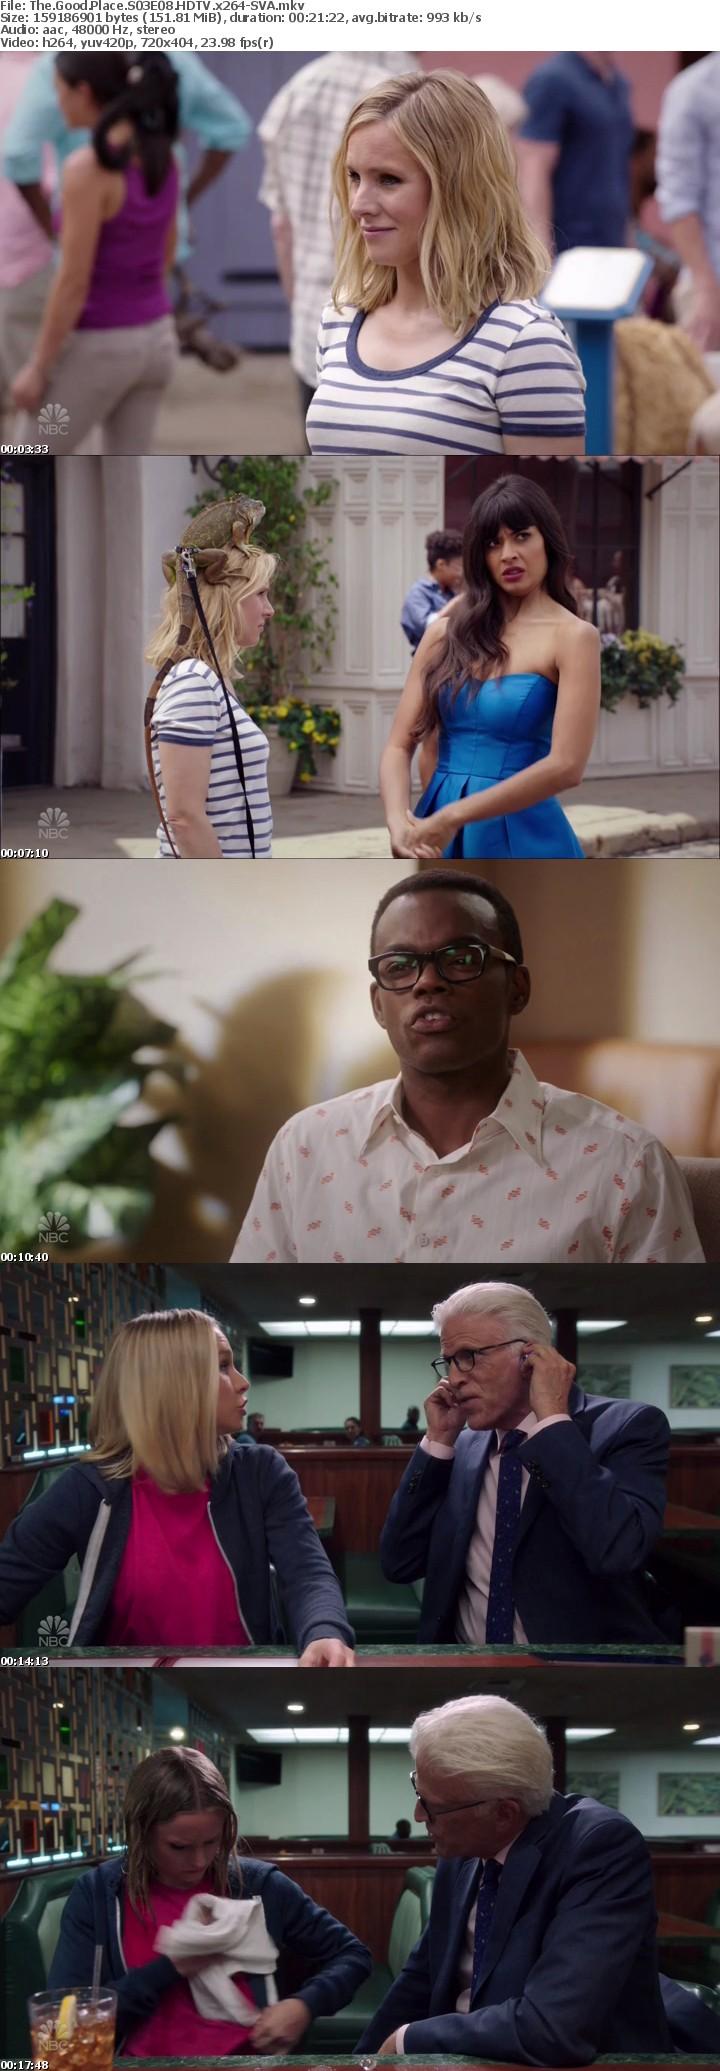 The Good Place S03E08 HDTV x264-SVA